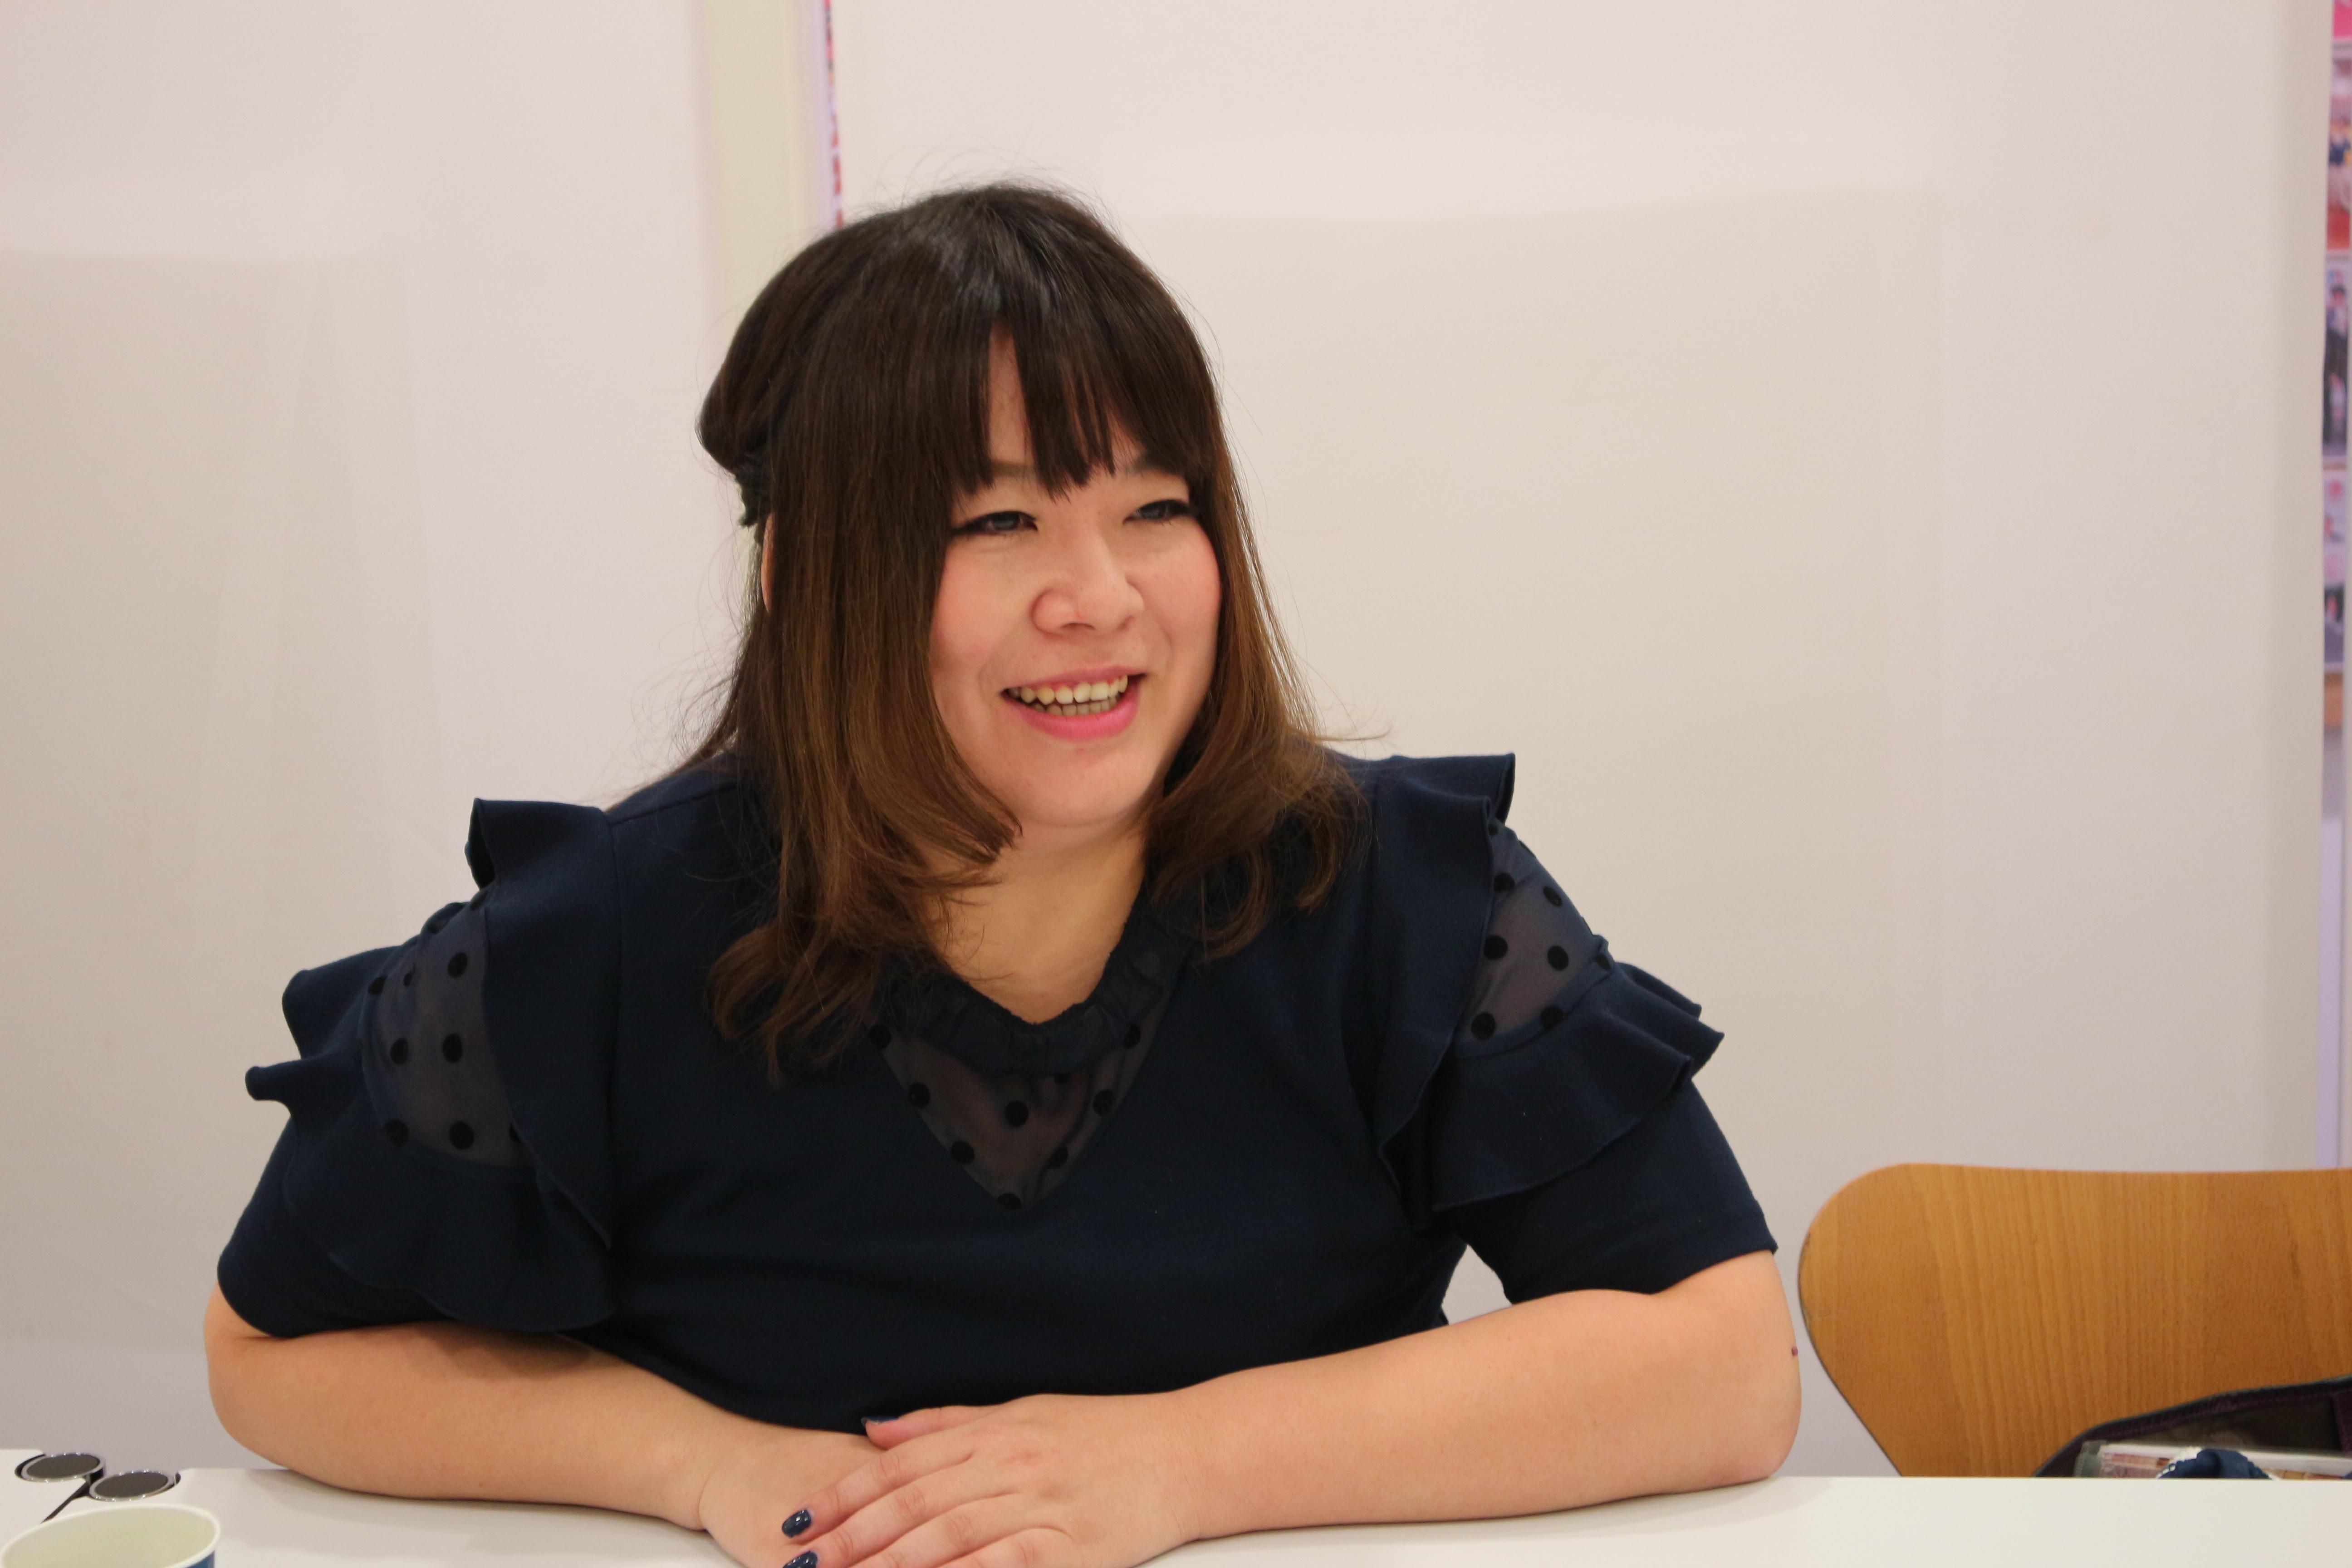 http://news.yoshimoto.co.jp/20181206114814-a00ffe3d5a0cd3cc8c570a4ba5944766e3714497.jpg